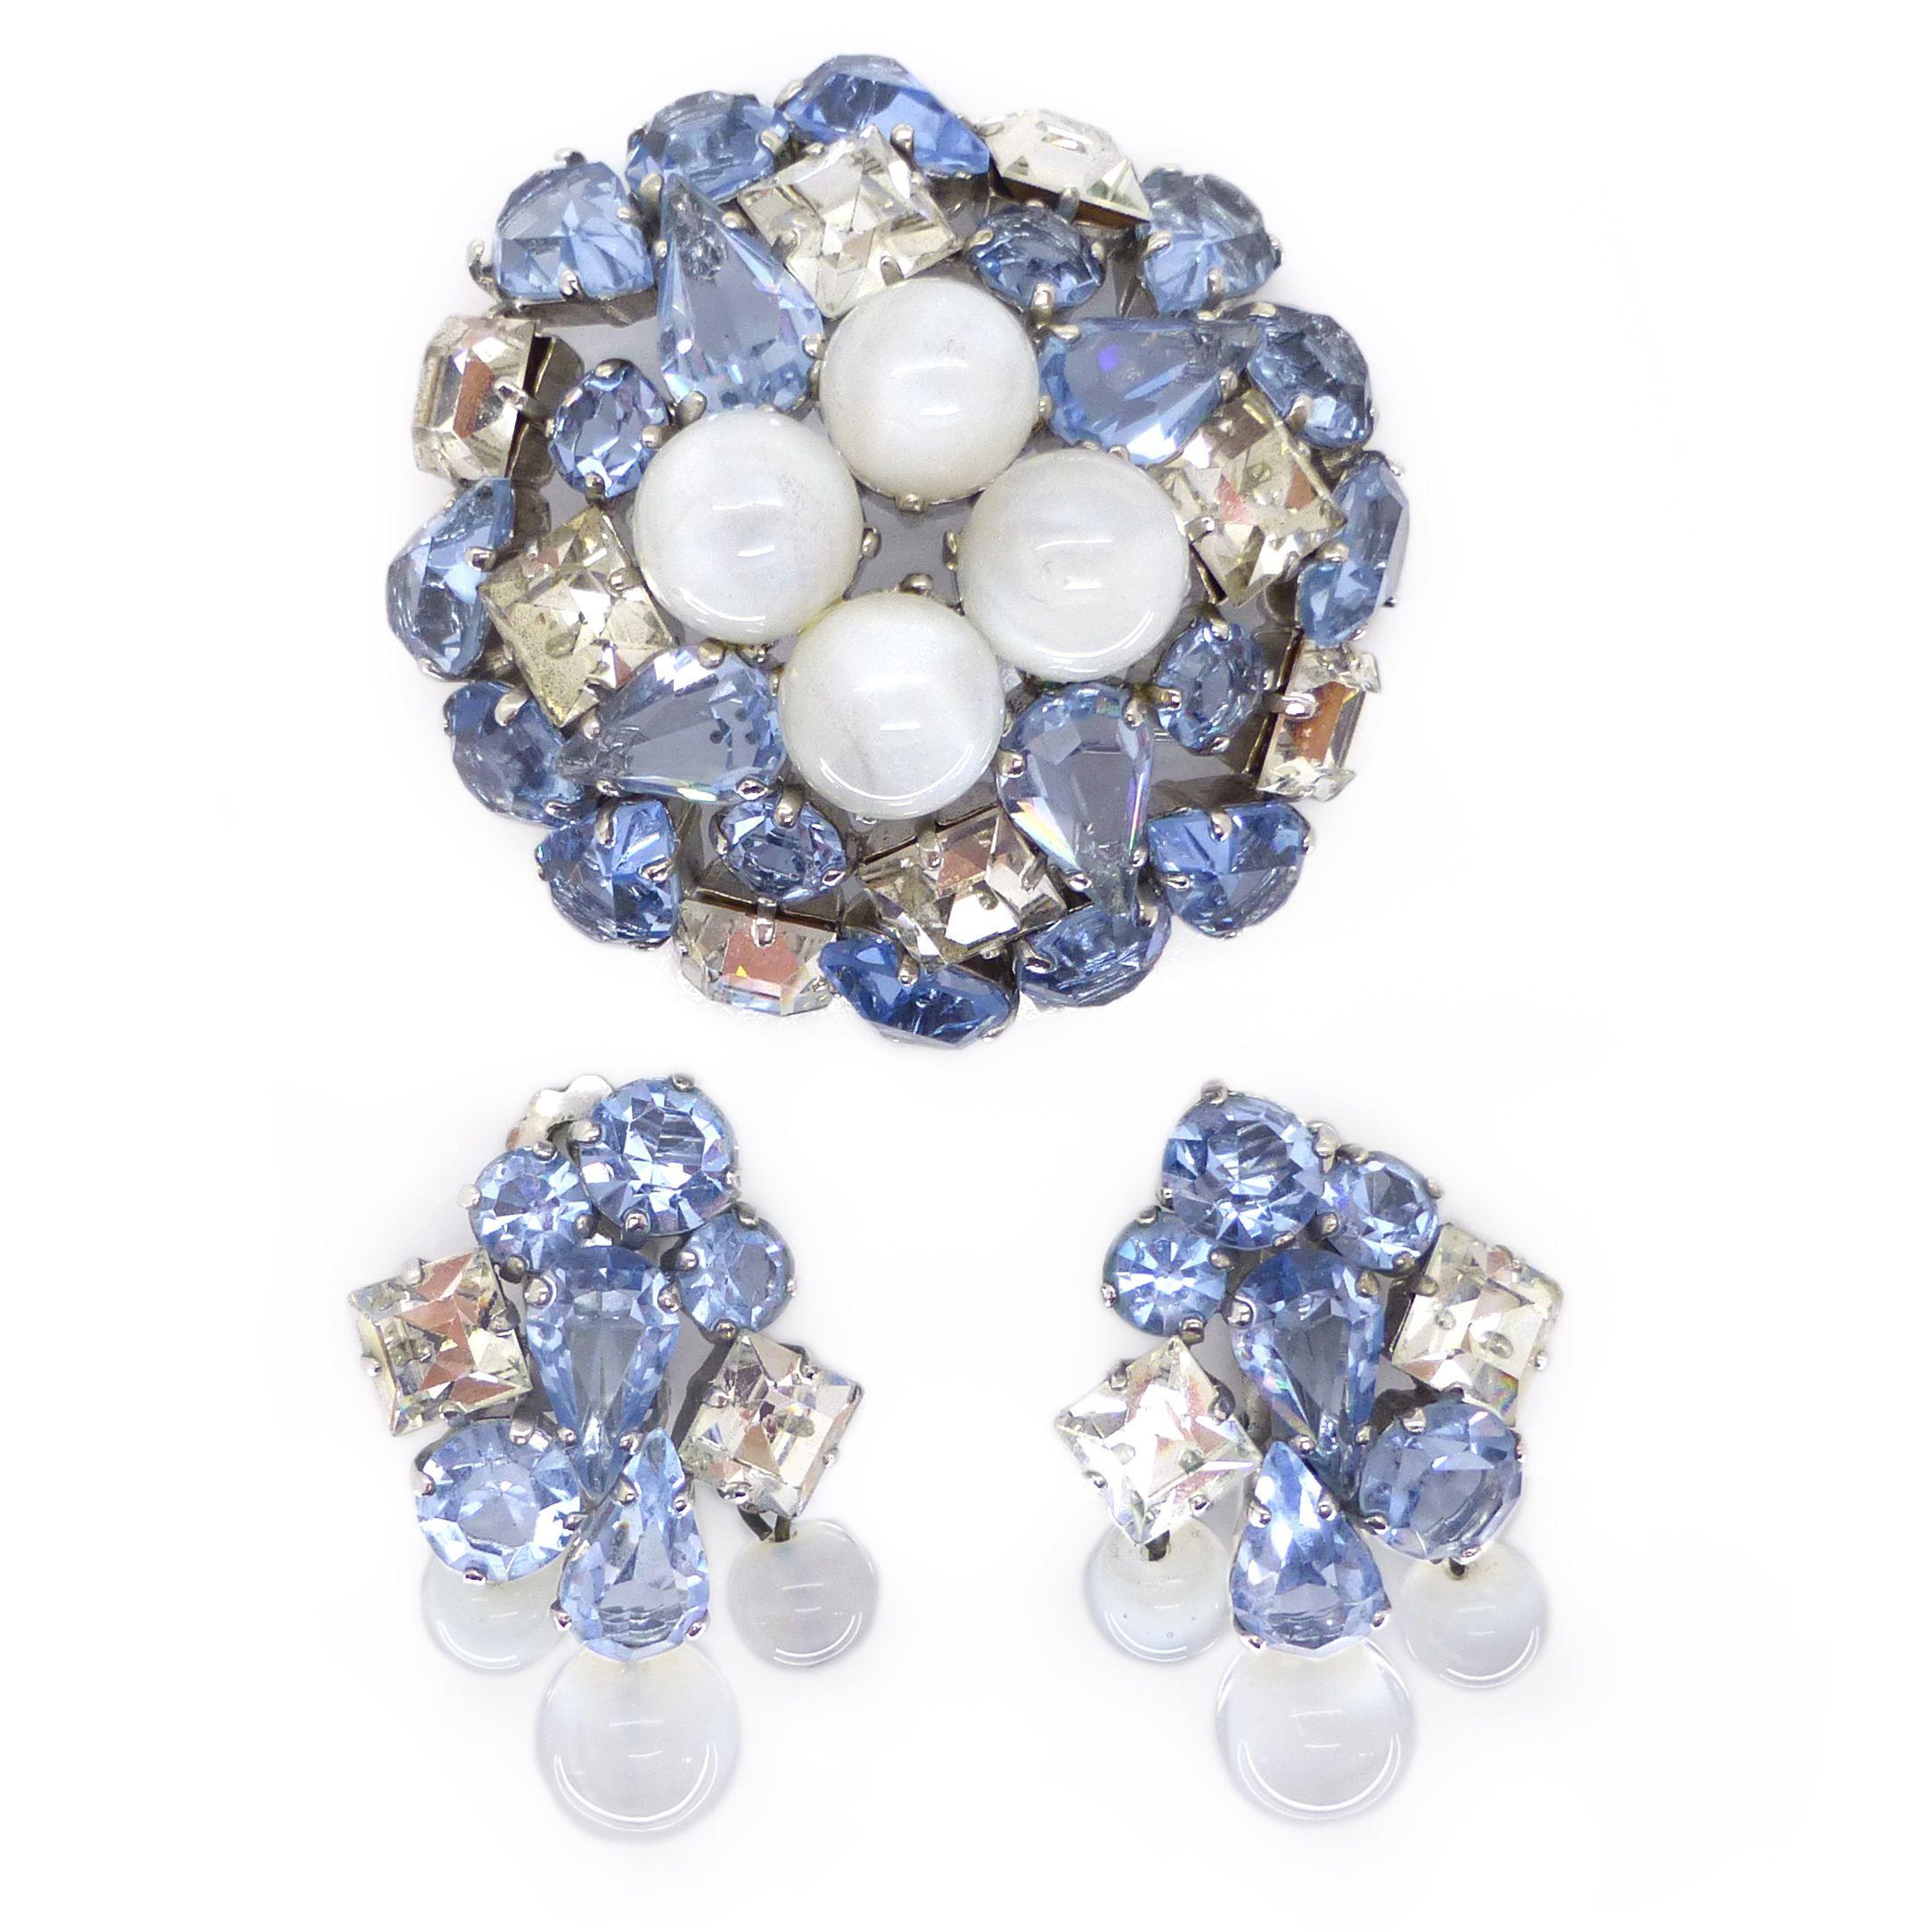 Vintage Christian Dior 1959 Moonstone Aqua Glass Brooch Earrings